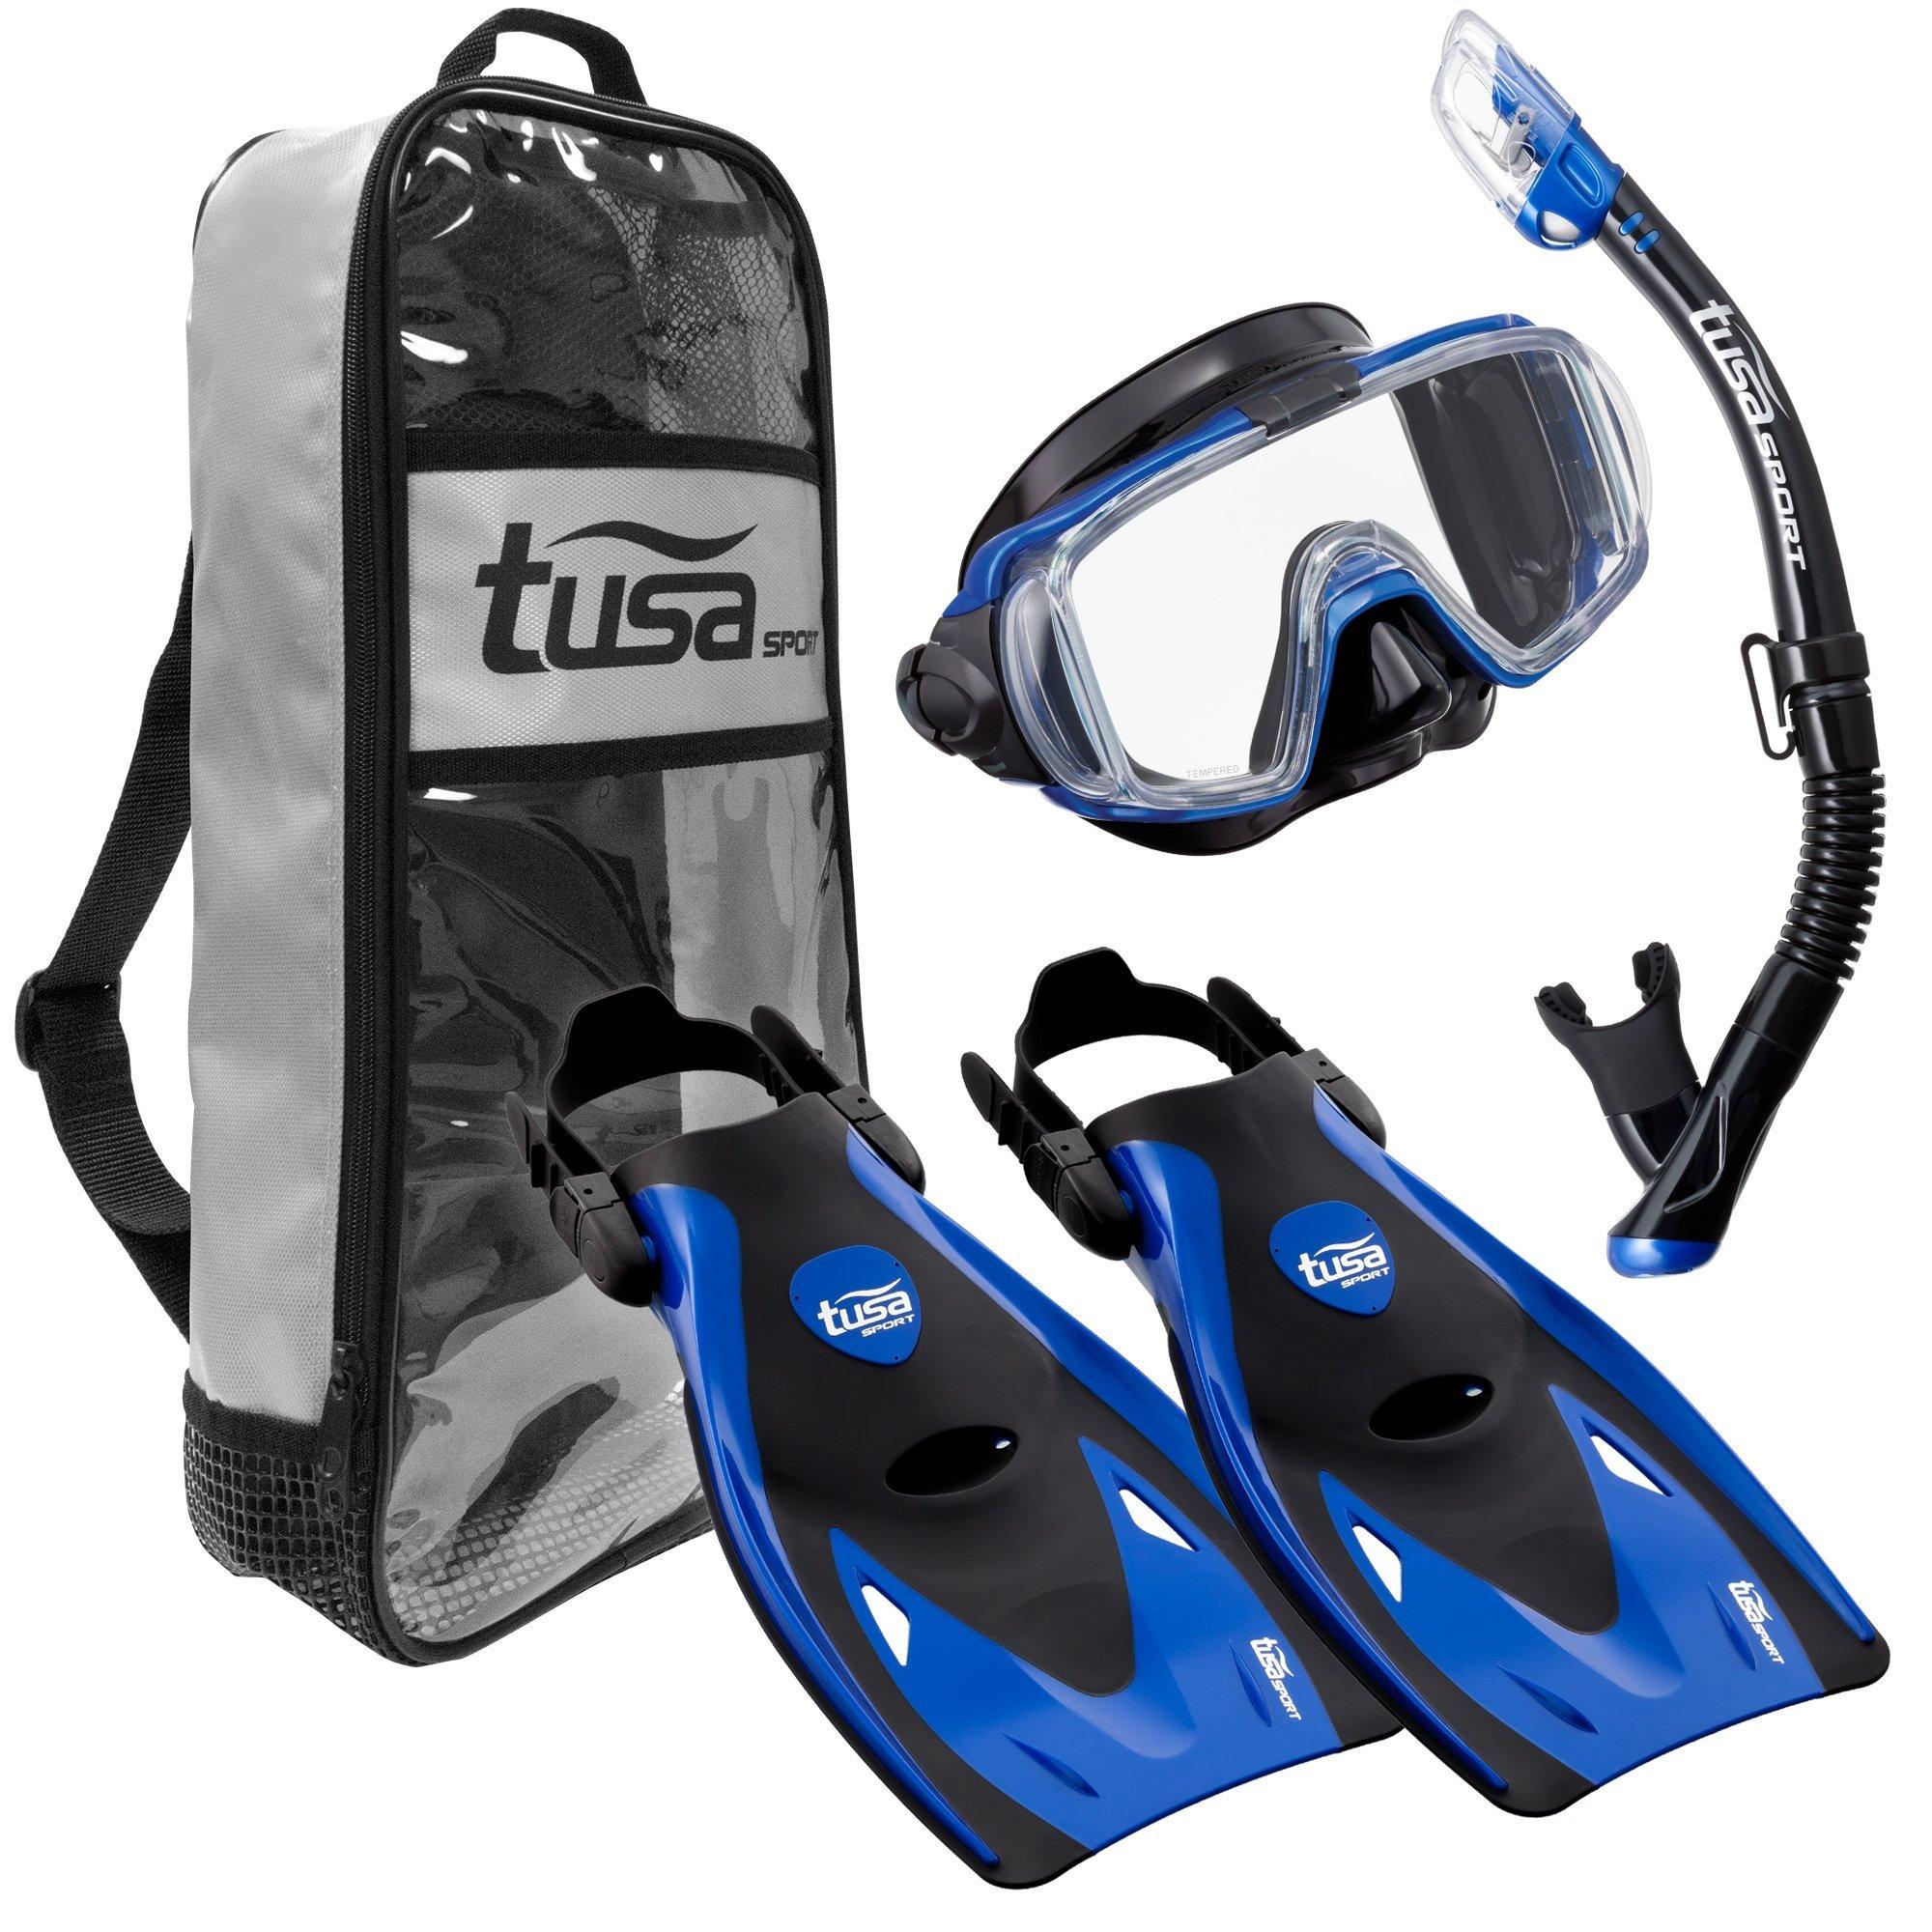 TUSA Sport Adult Black Series Visio Tri-Ex Mask, Dry Snorkel, and Fins Travel Set, Black/Metallic Blue, Large